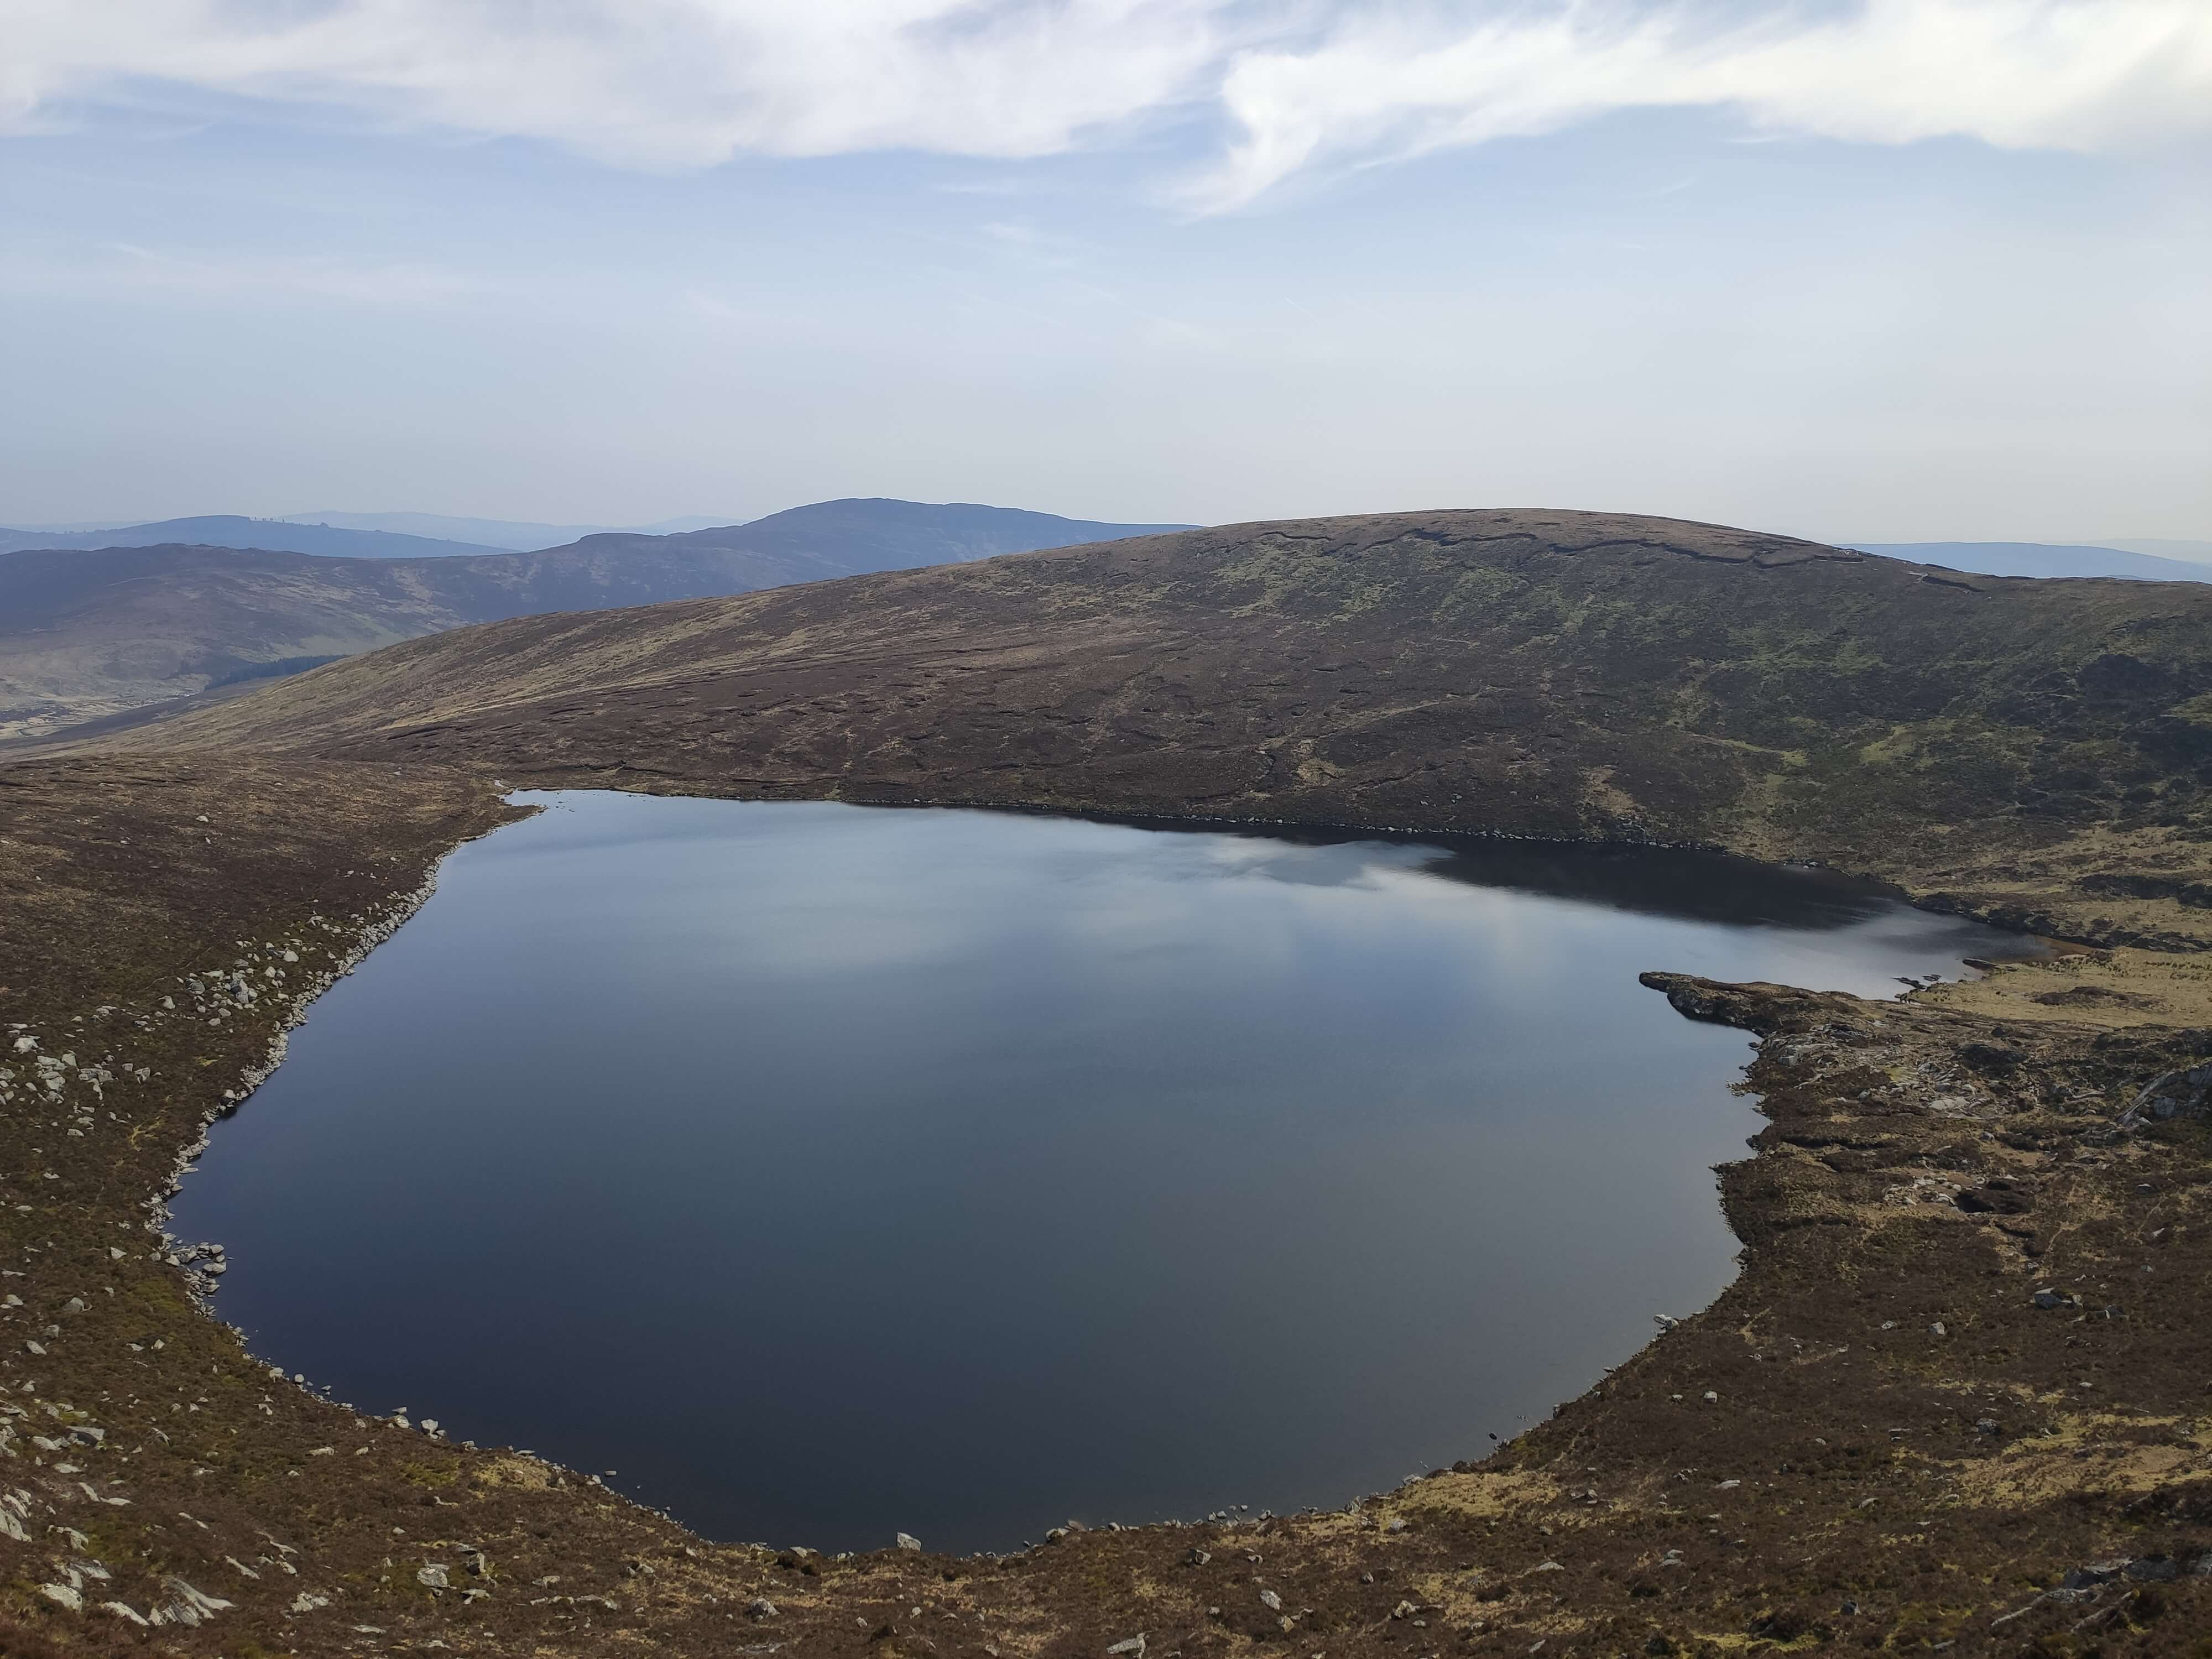 The Heart Shaped Lake/Lough Ouler